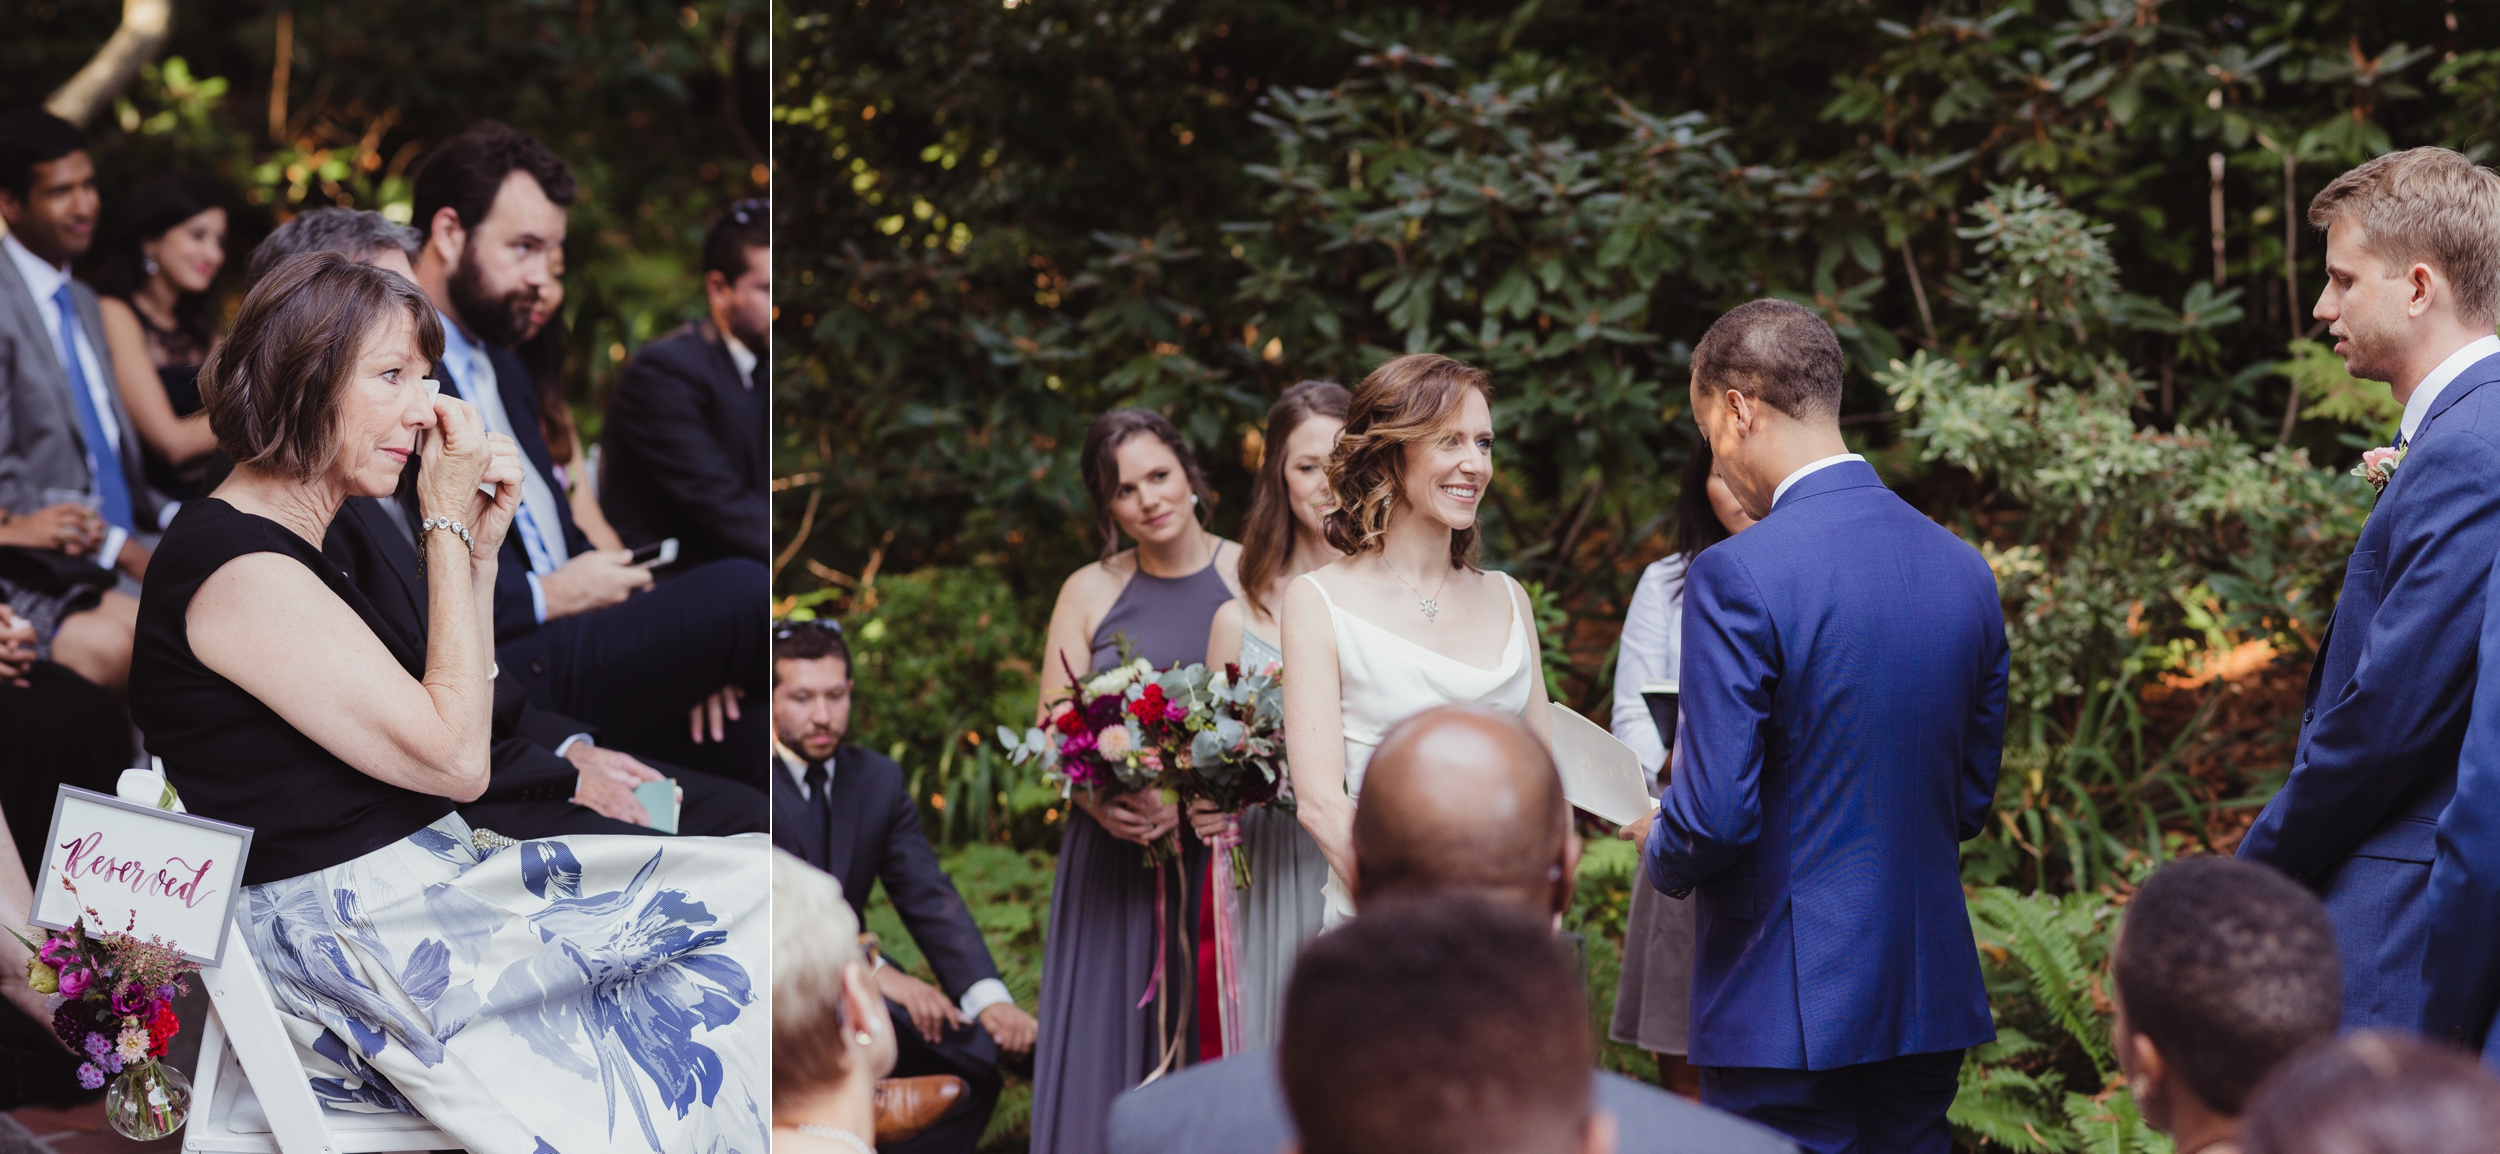 31-outdoor-art-club-wedding-vivianchen-218_WEB.jpg